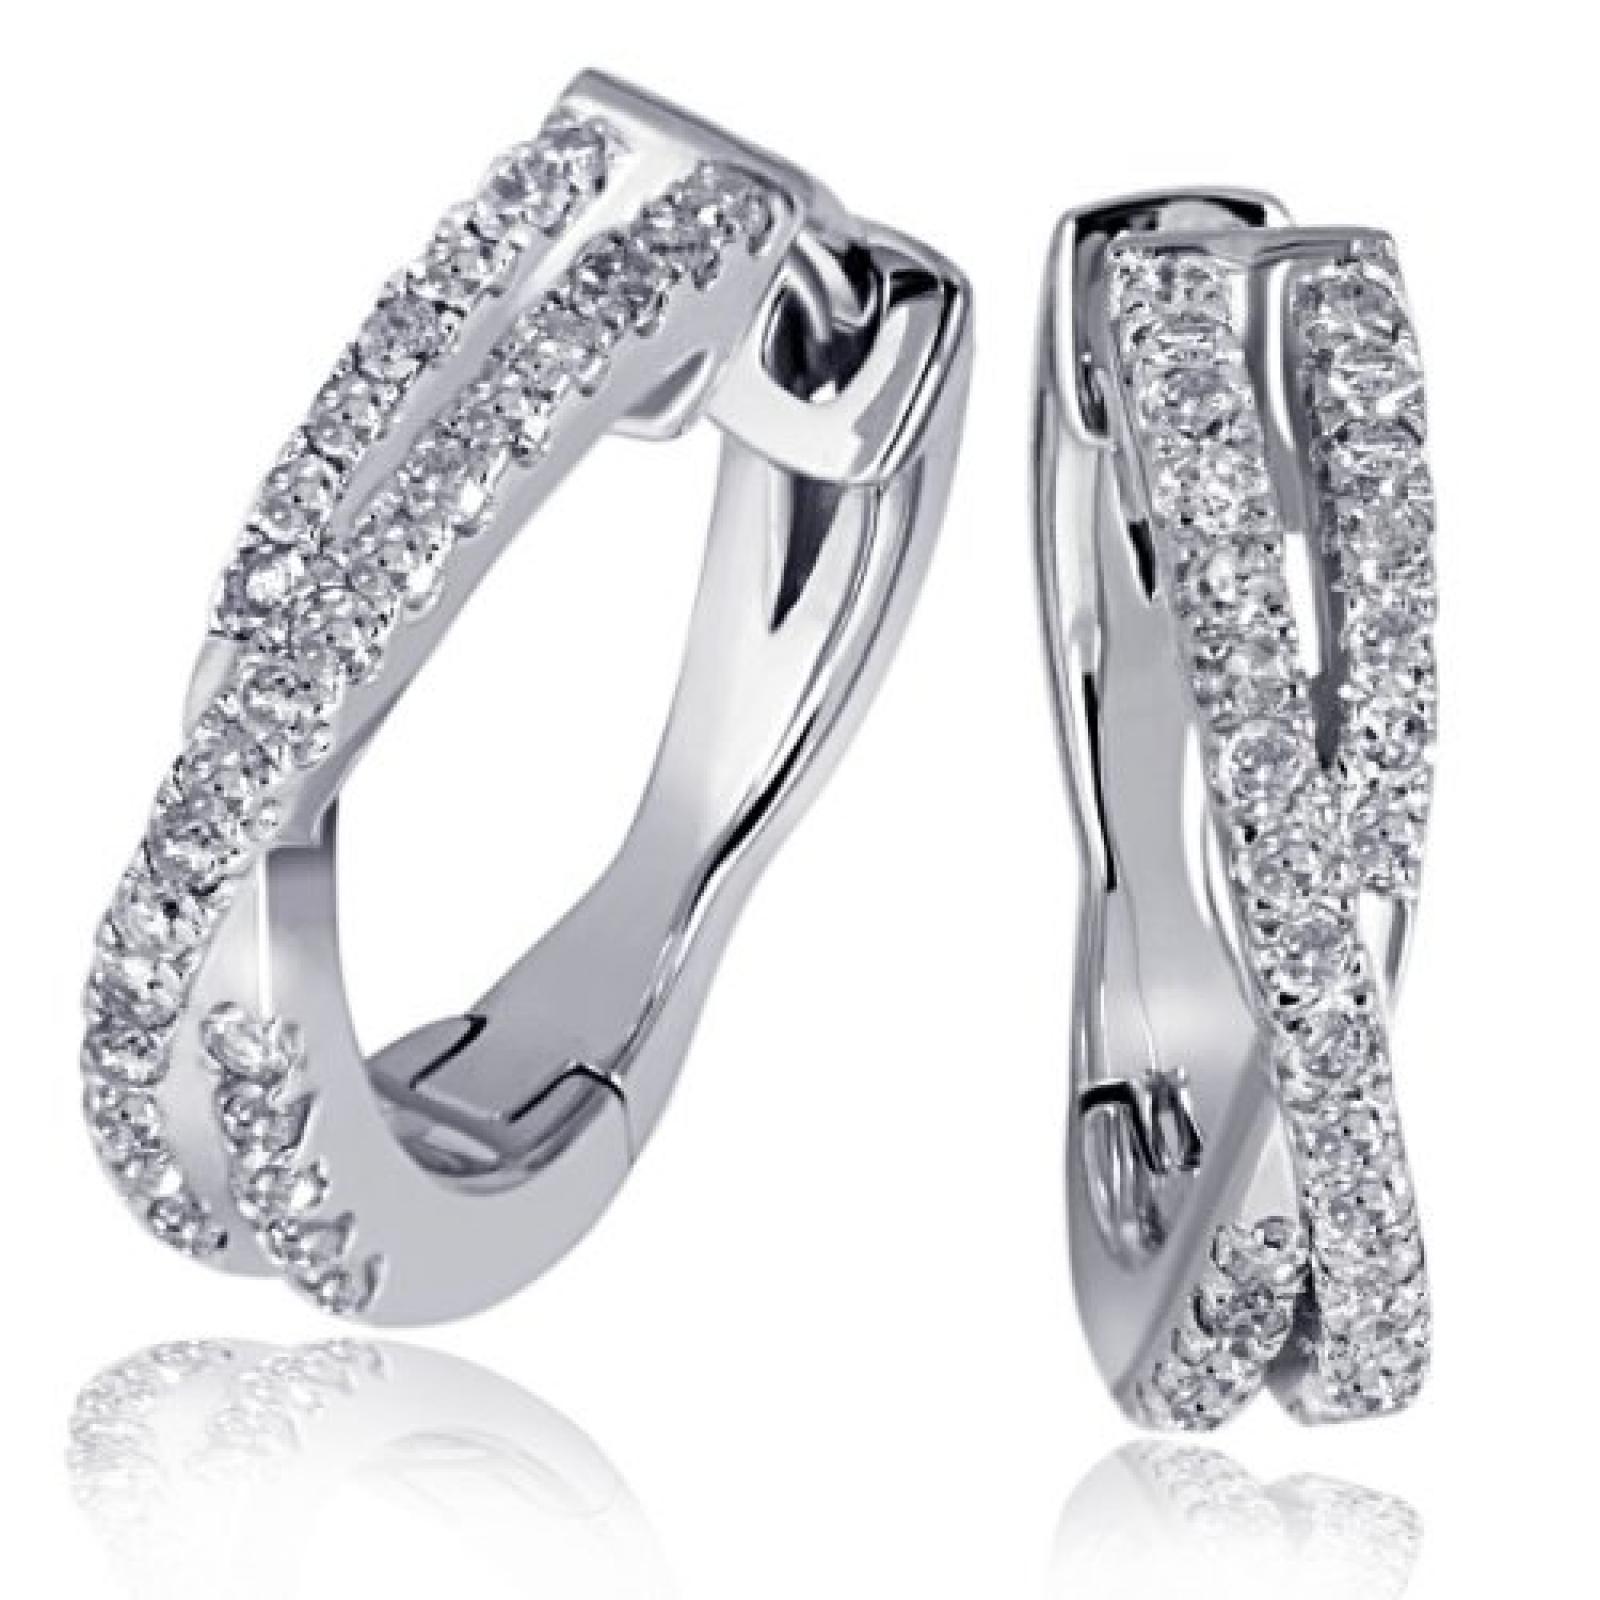 goldmaid Damen-Creolen Linien 585 Weißgold 60 Diamanten 0,24ct 13 mm Pa O5572WG